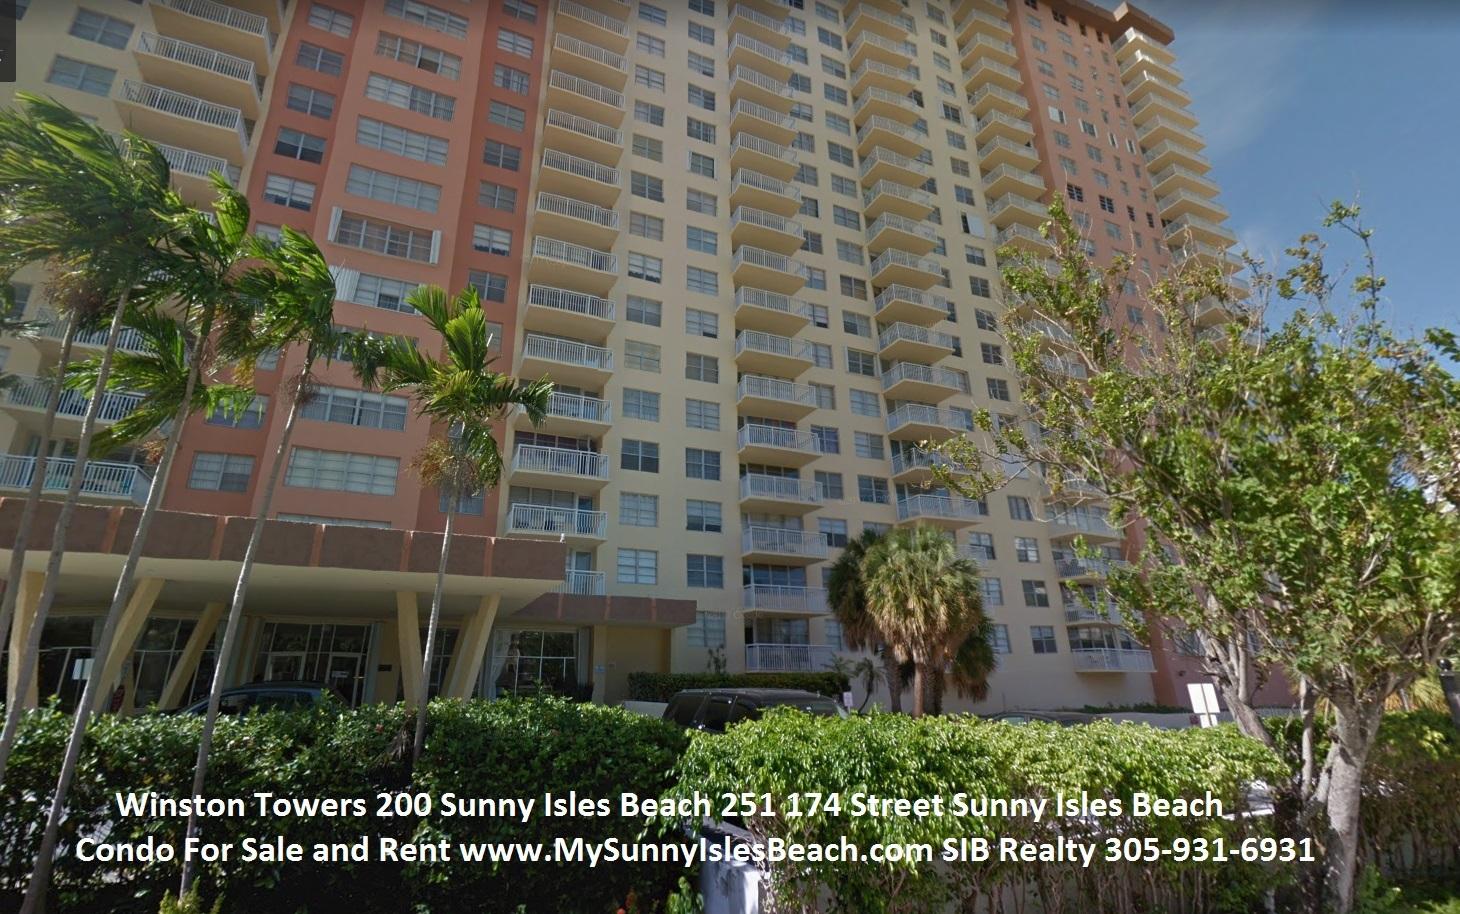 Winston Towers 200 Sunny Isles Beach